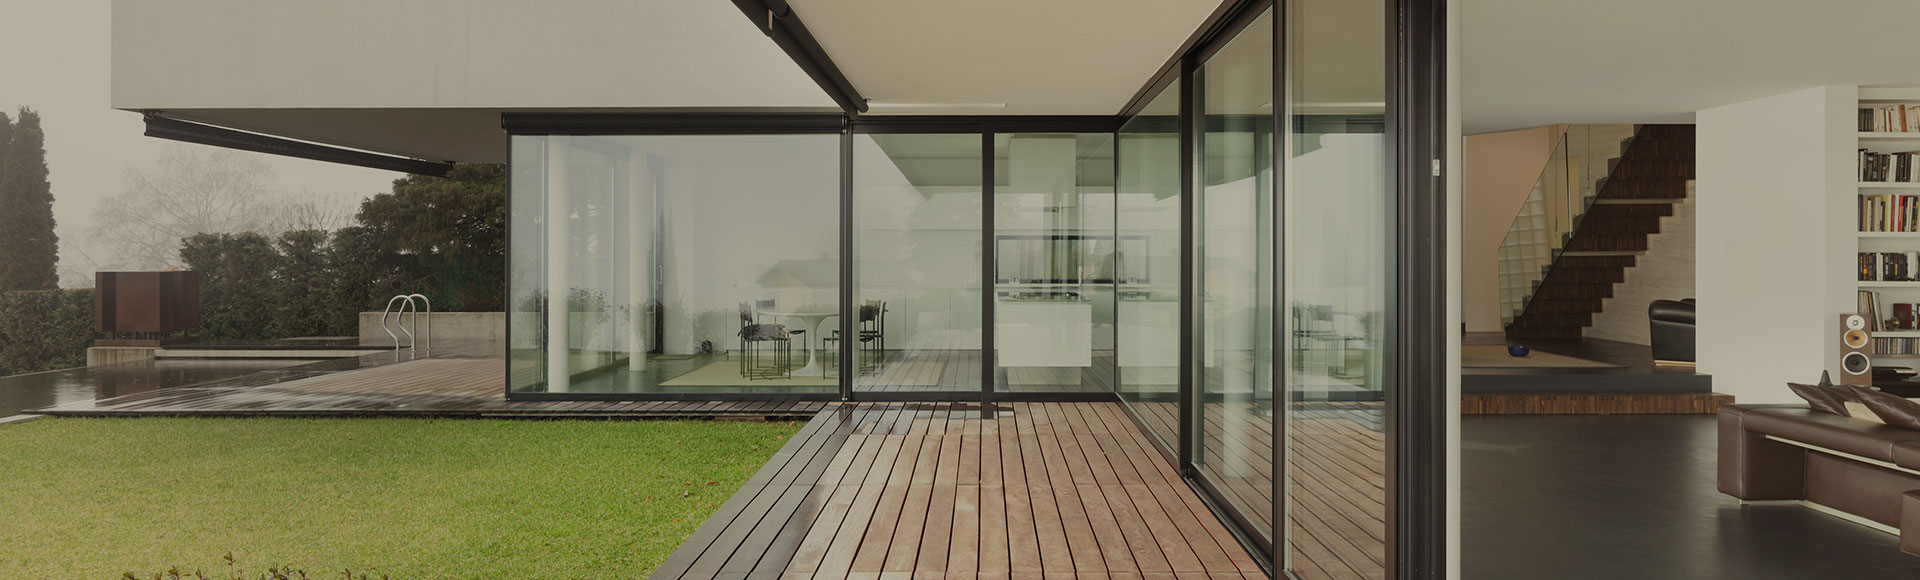 south croydon glaziers